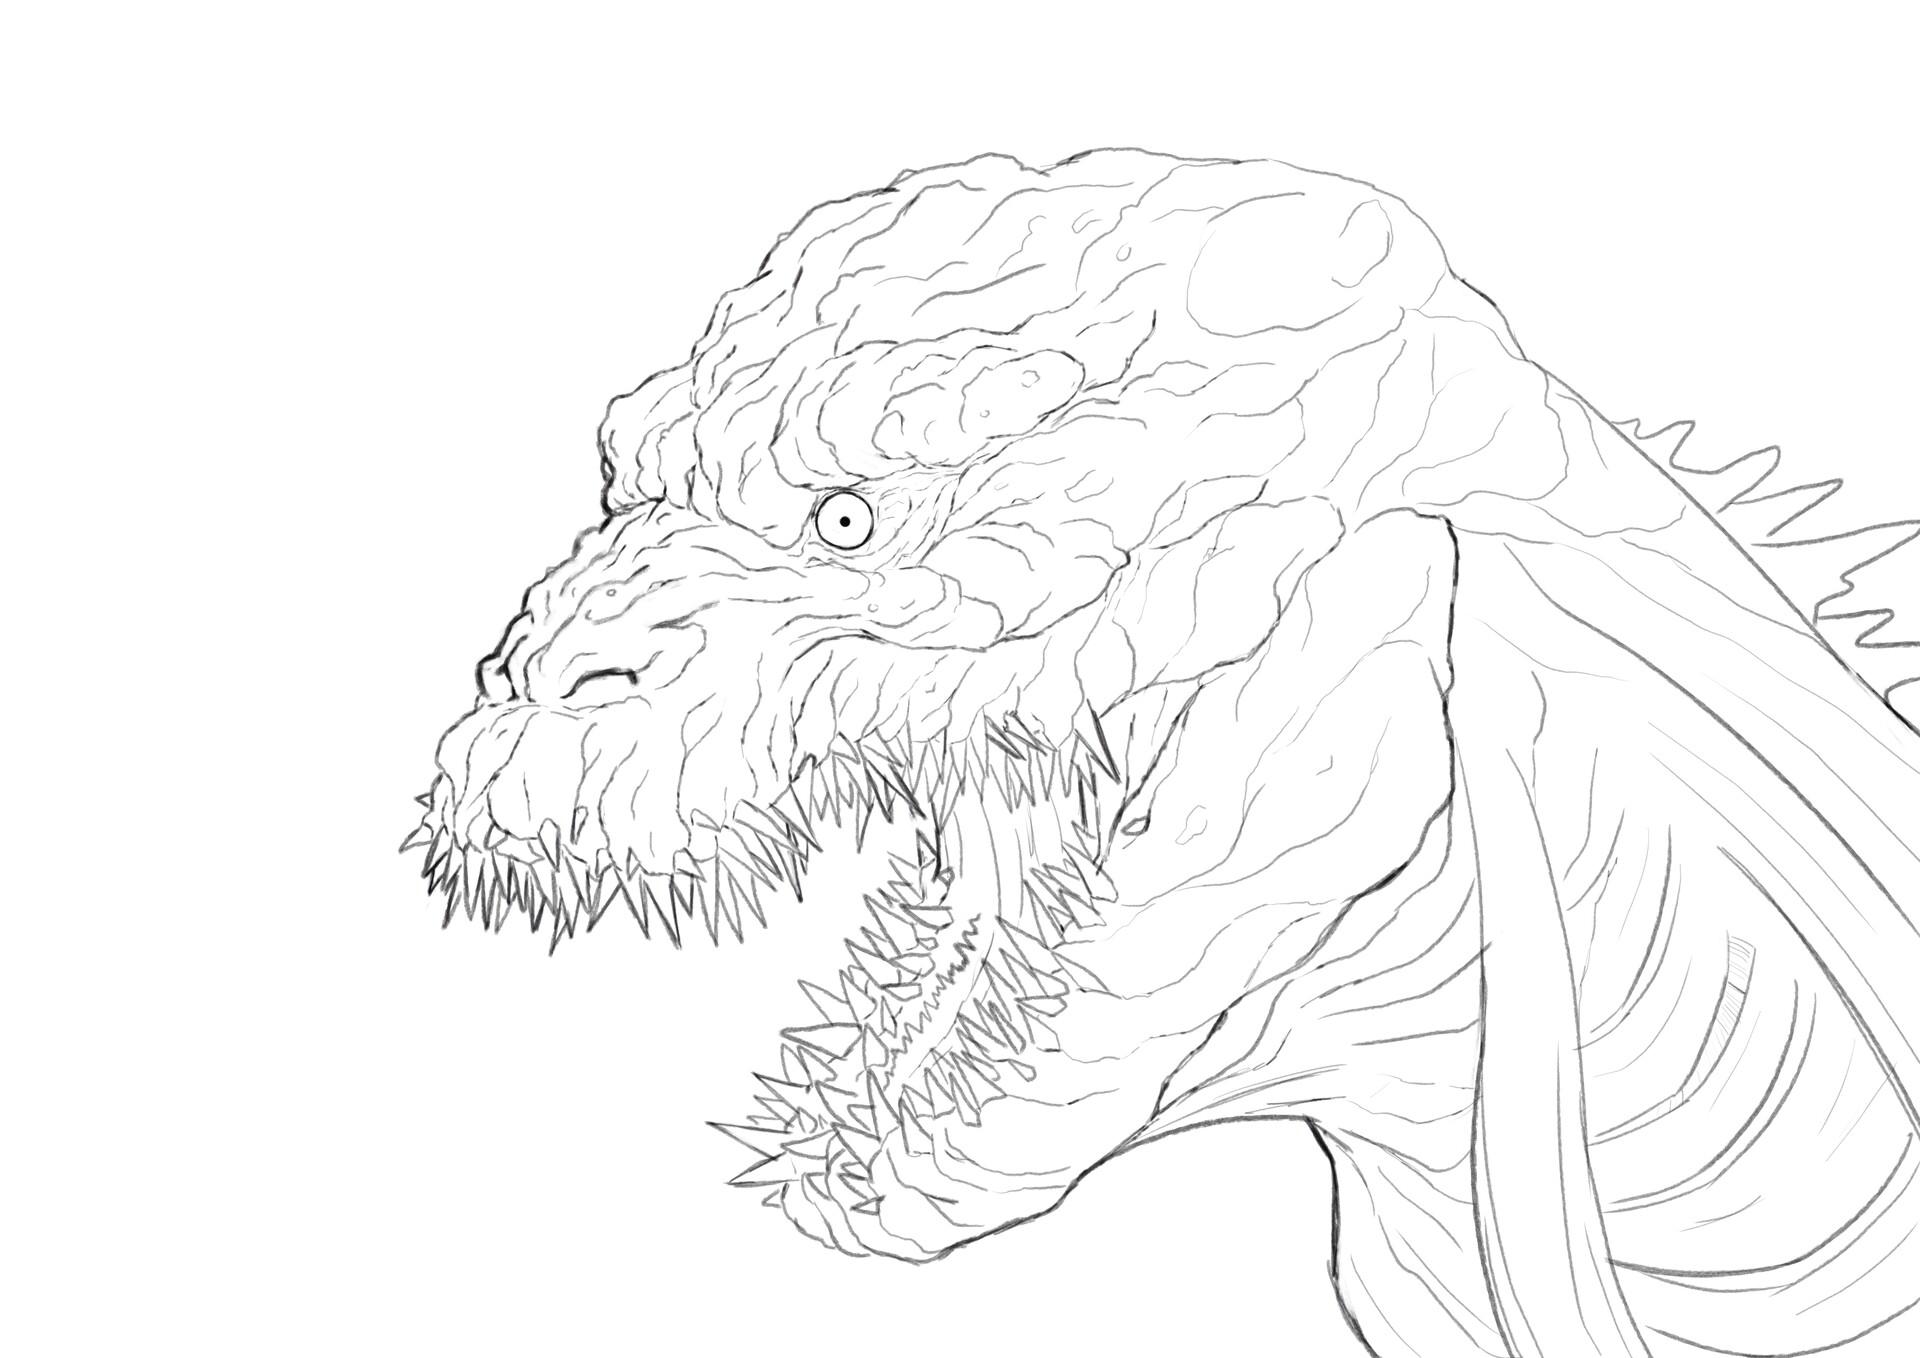 Art Sketch Shin Godzilla